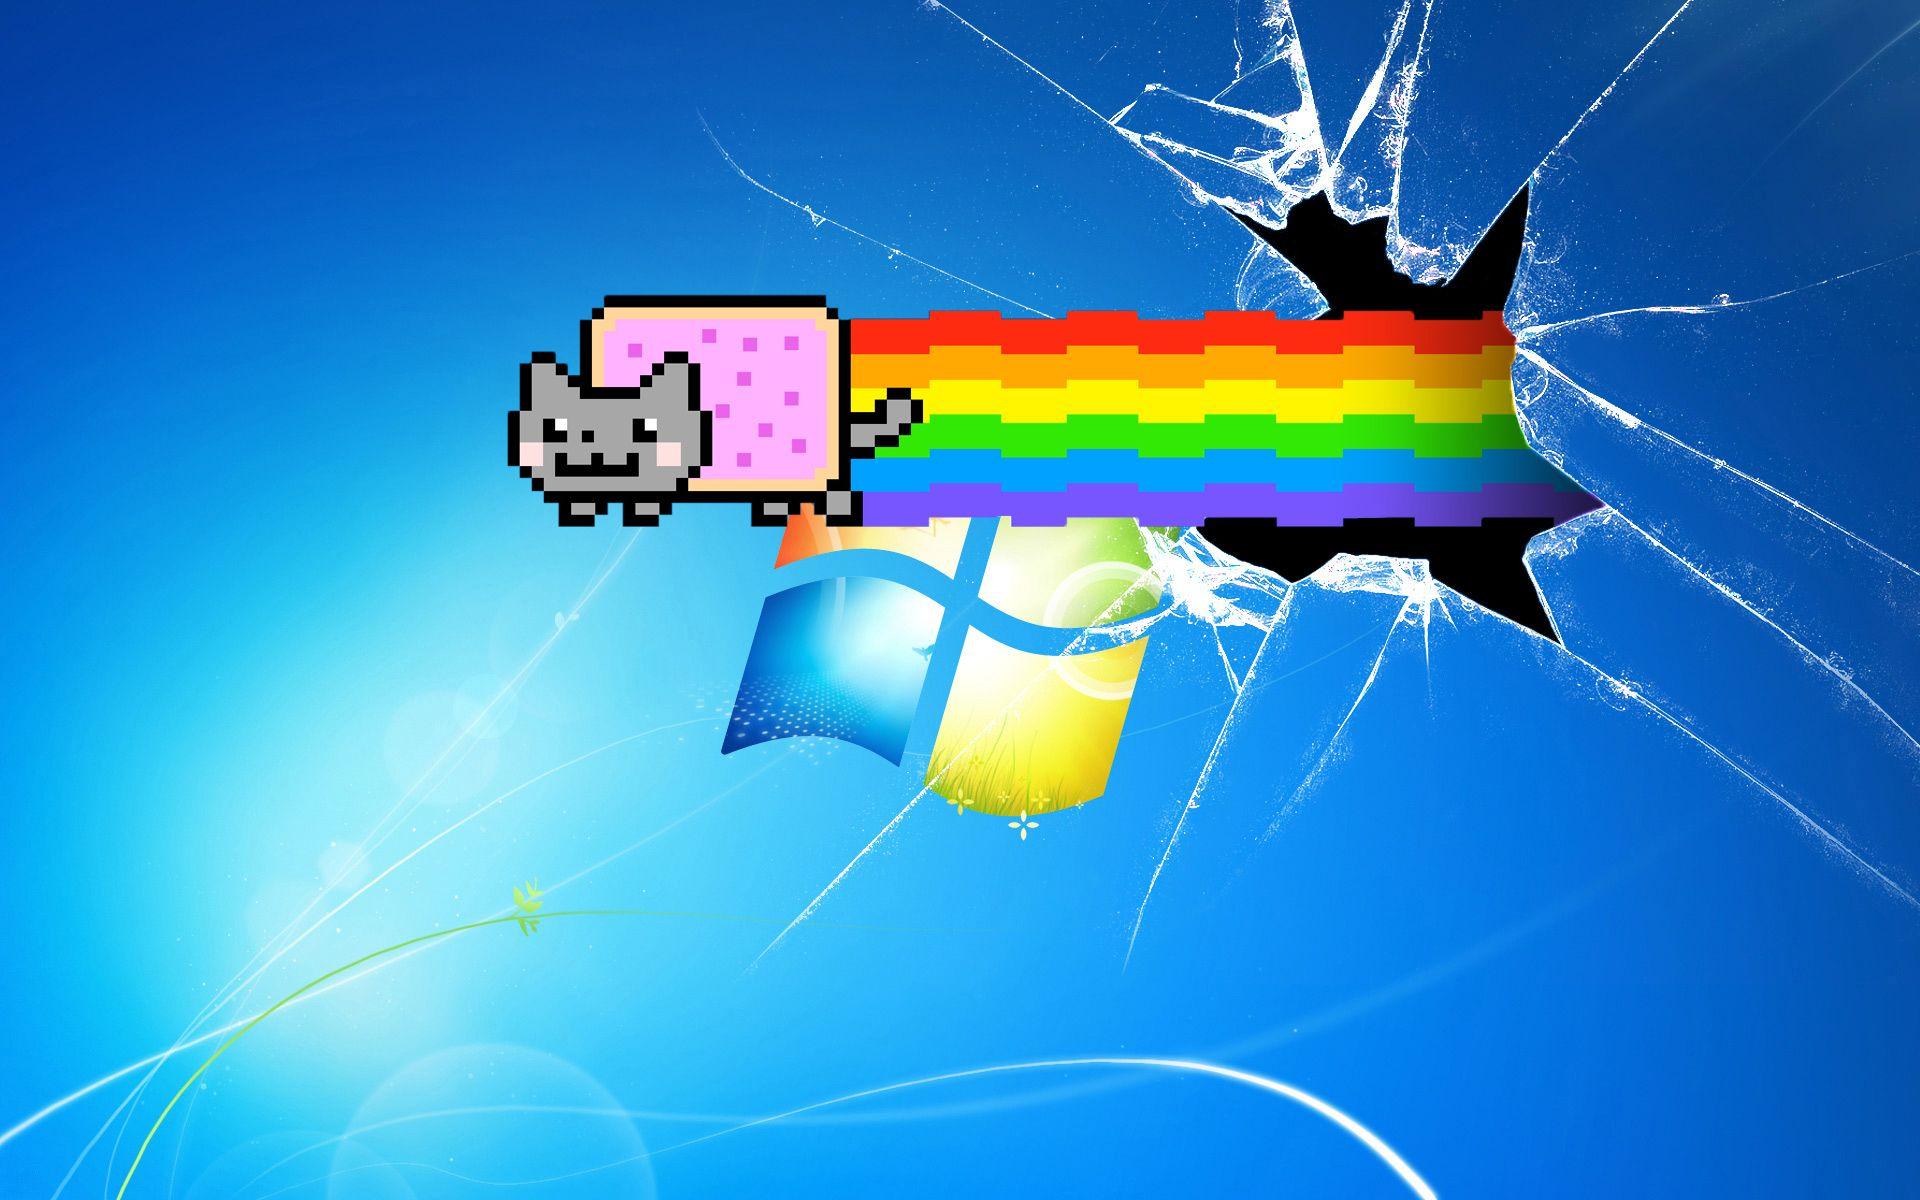 Kitty Computer Screen Wallpaper Broken Windows Cat Paper